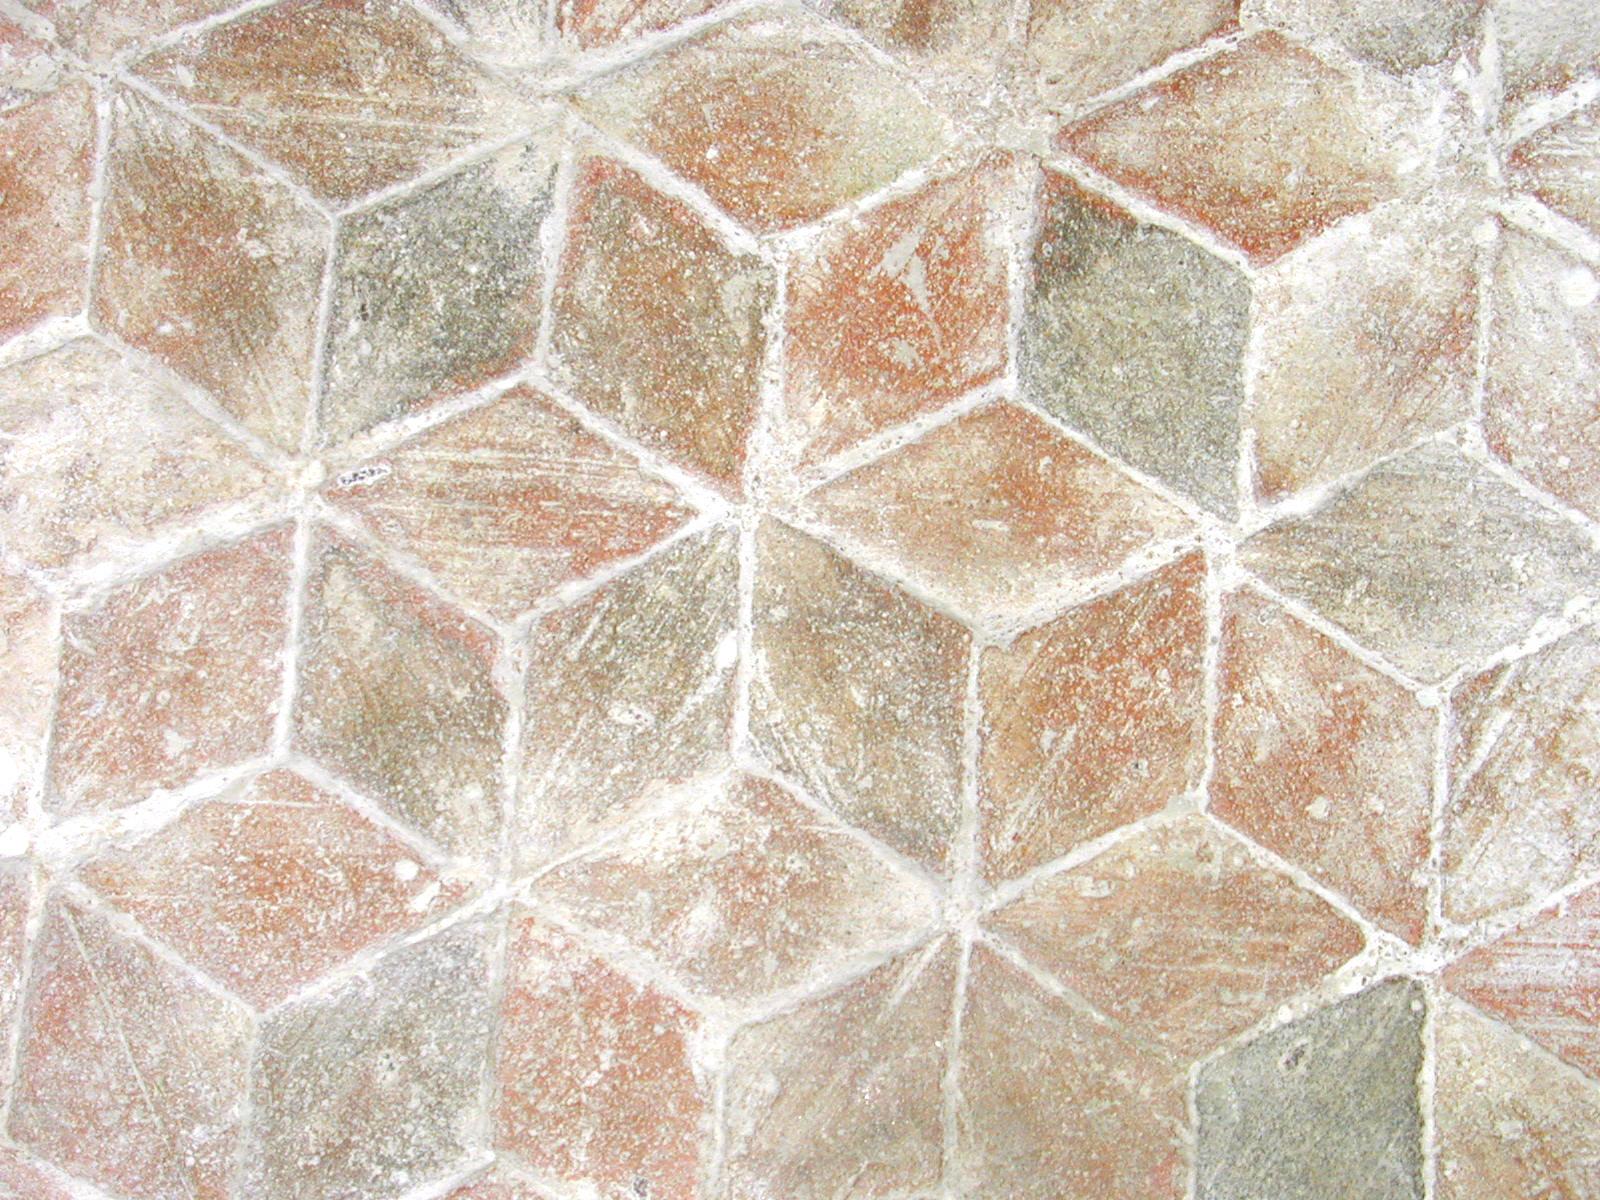 Imageafter Textures Grounds Texture Pattern Floor Tile Tiles